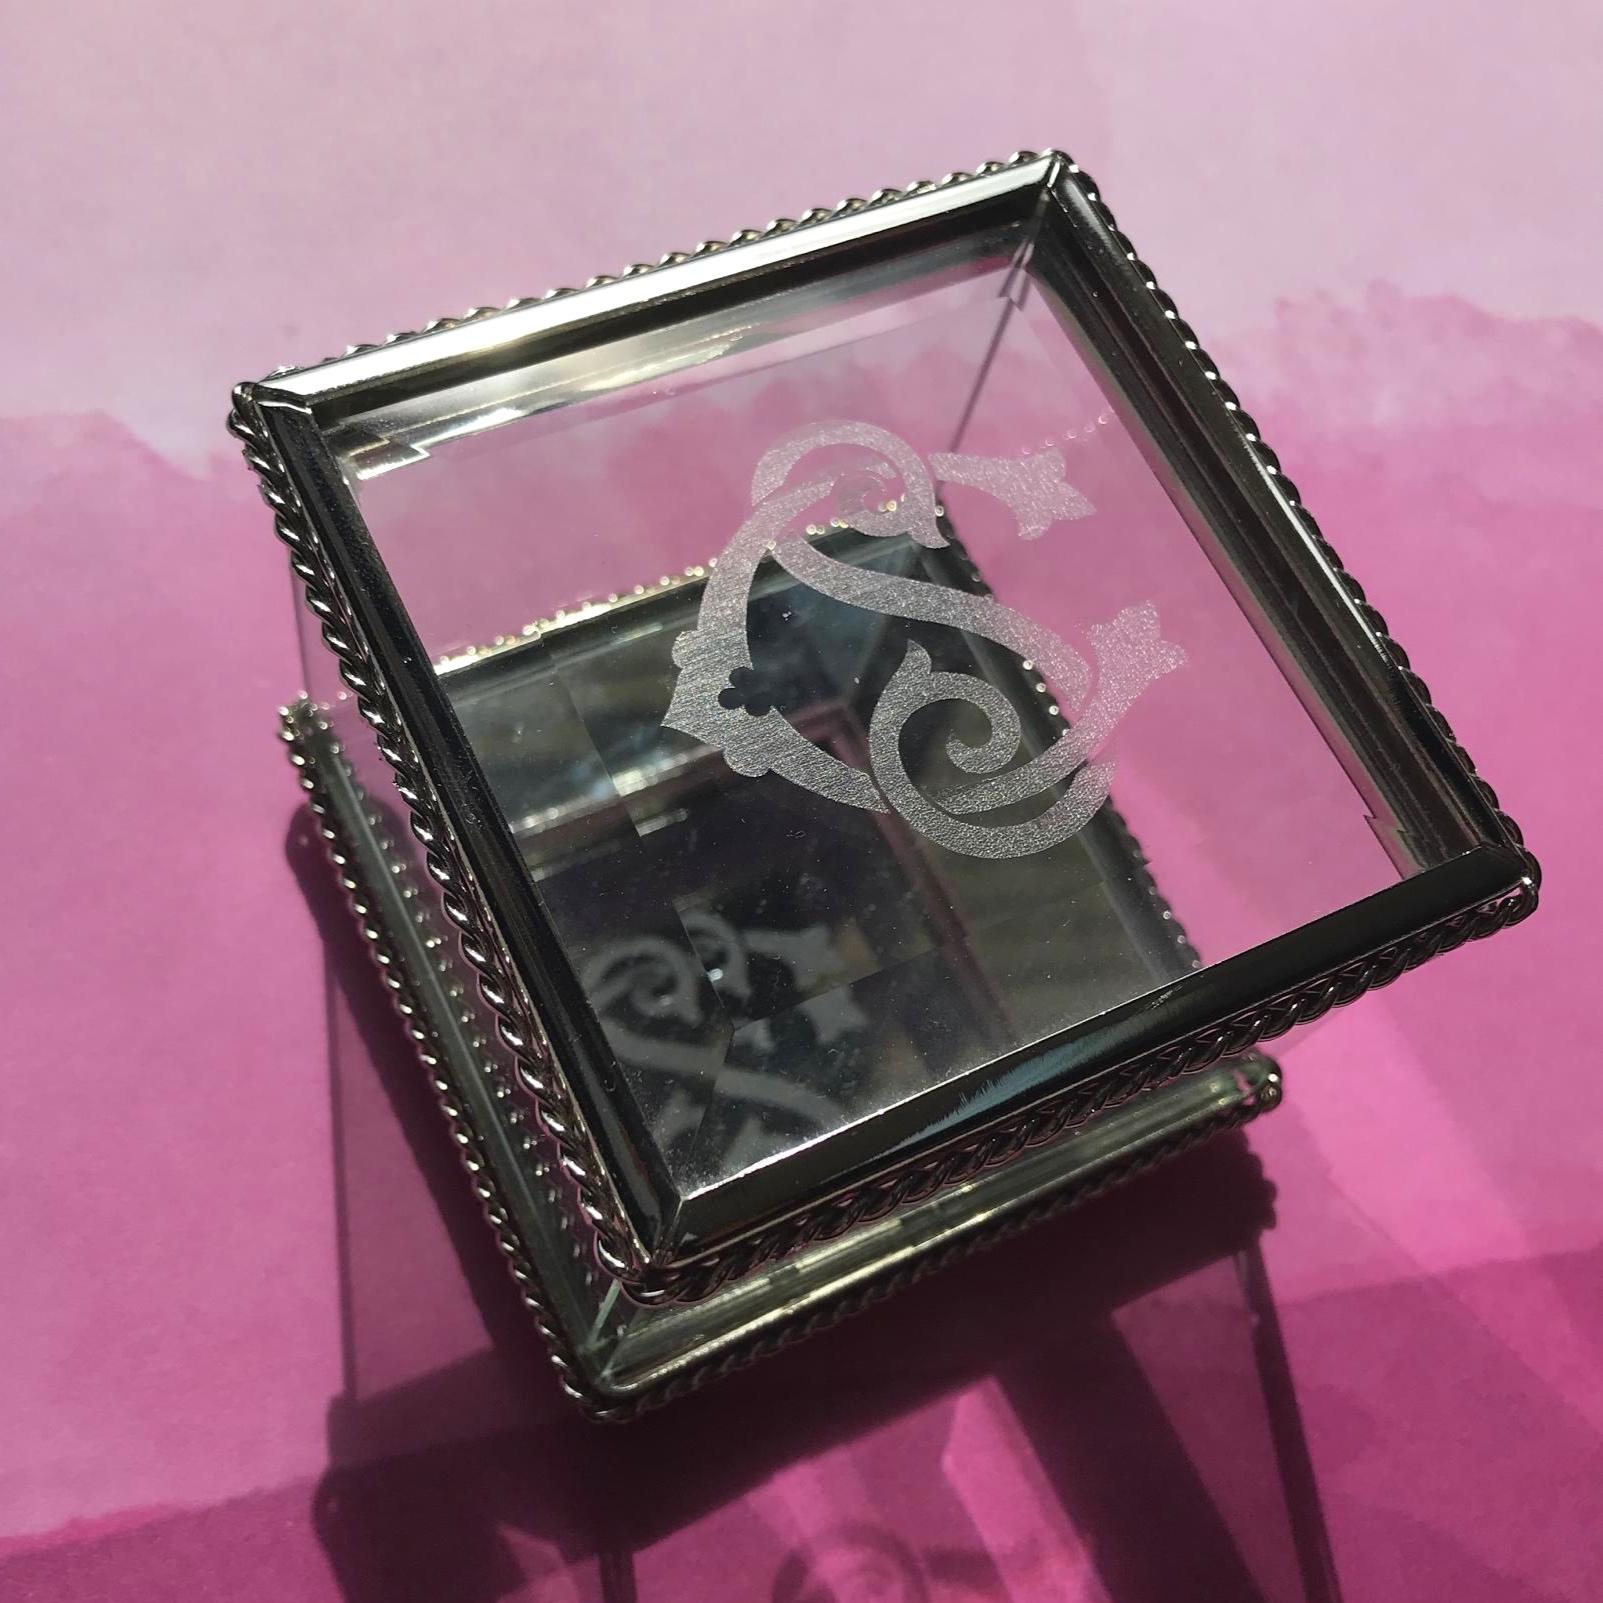 Laser engraved glass trinket box